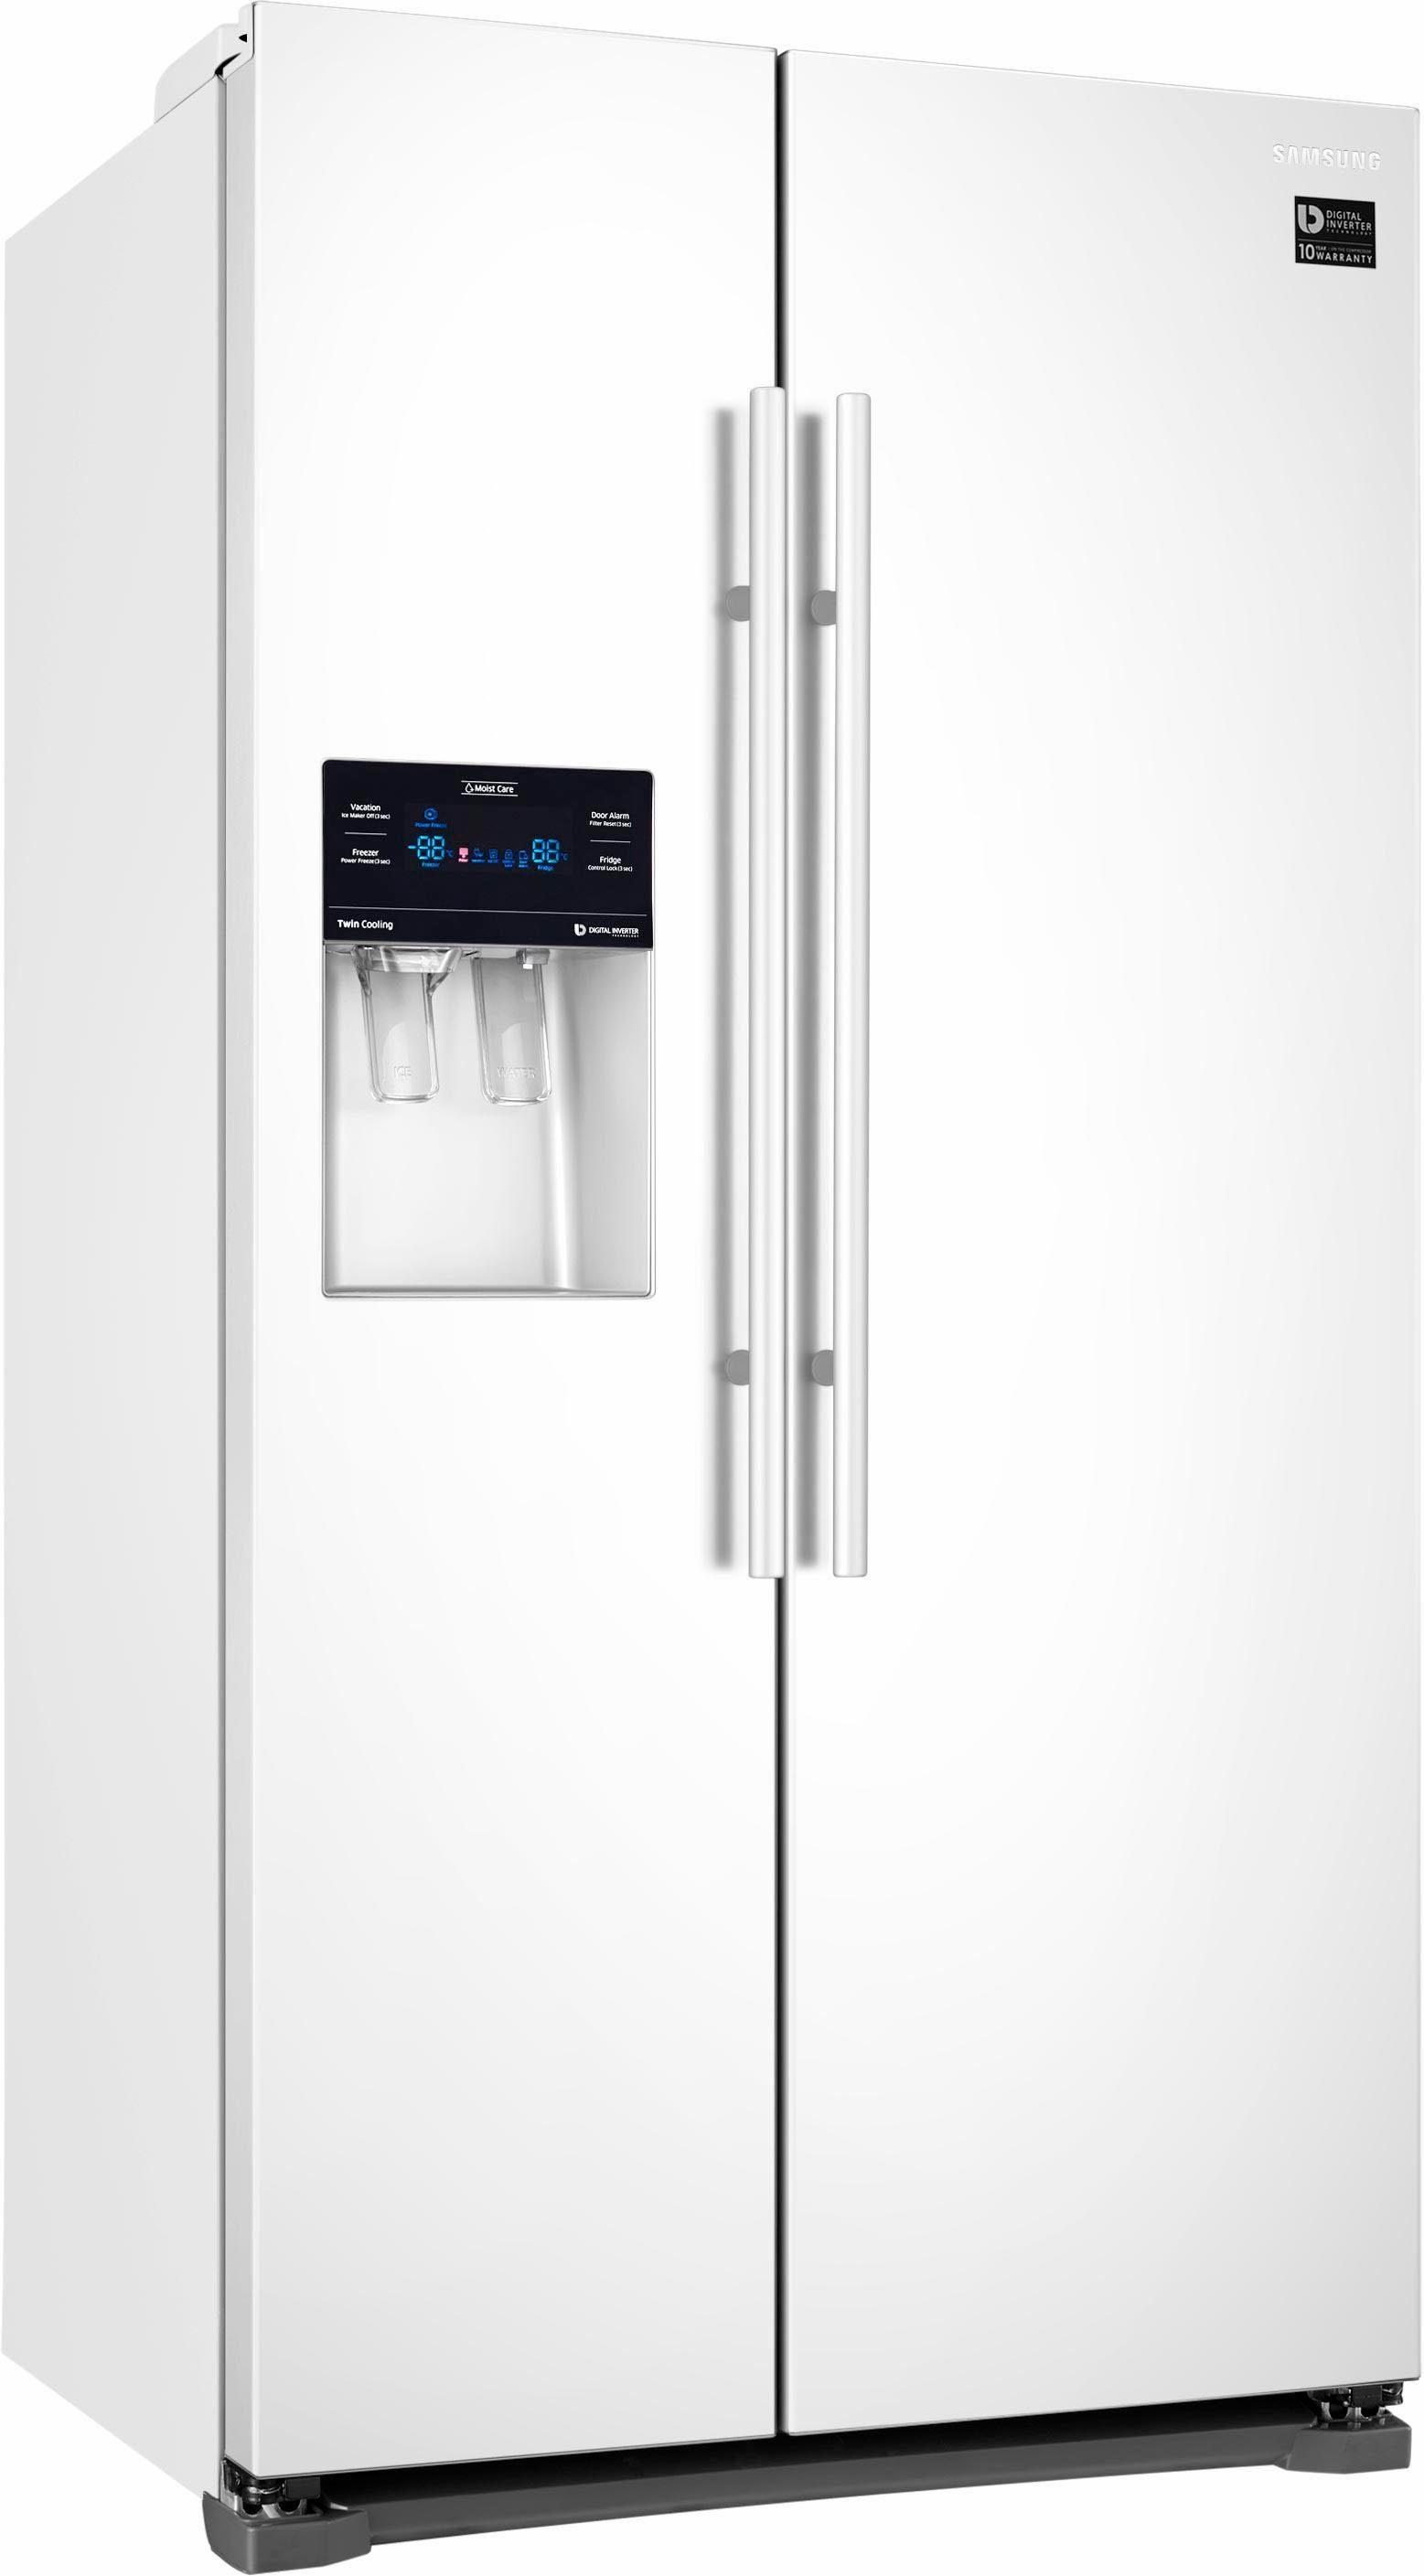 Samsung Side-by-Side RS53K4400WW, 178,9 cm hoch, 91,2 cm breit